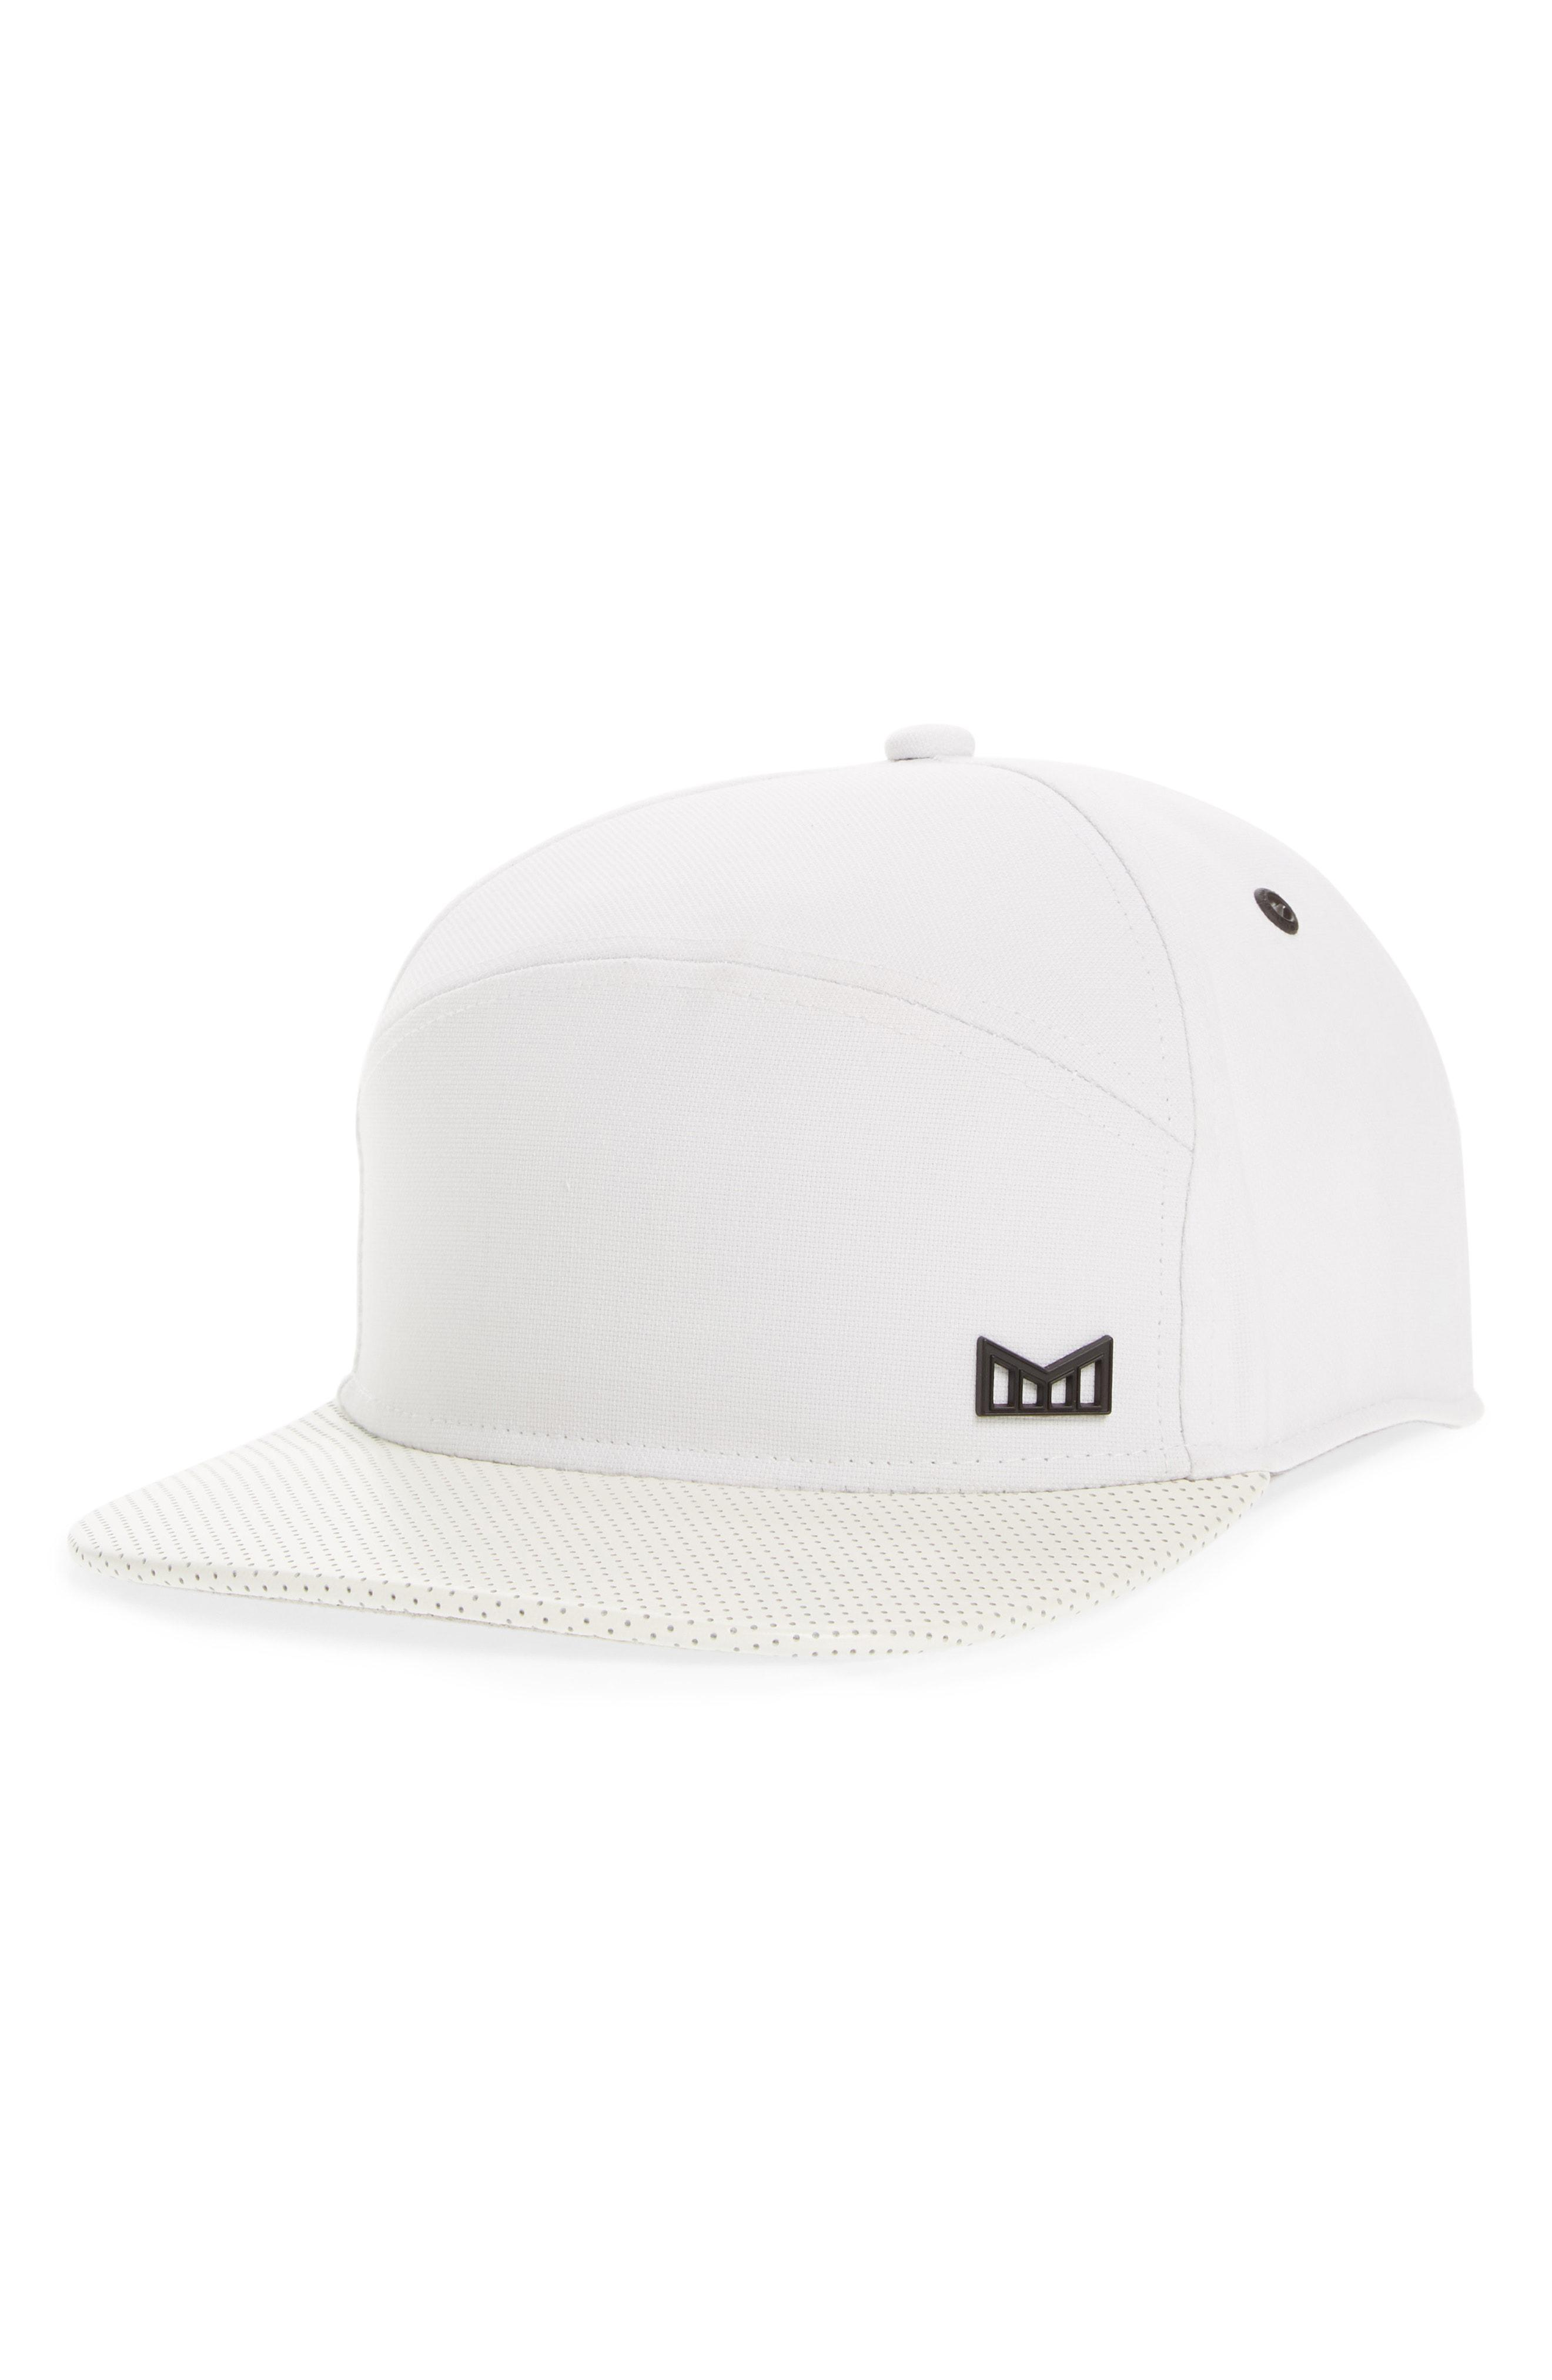 best service e18f1 ef6d6 get melin glory days strapback baseball cap af866 acfe7  promo code lyst  melin the vision horizon fit flat brim baseball cap in 3ac67 f86e6